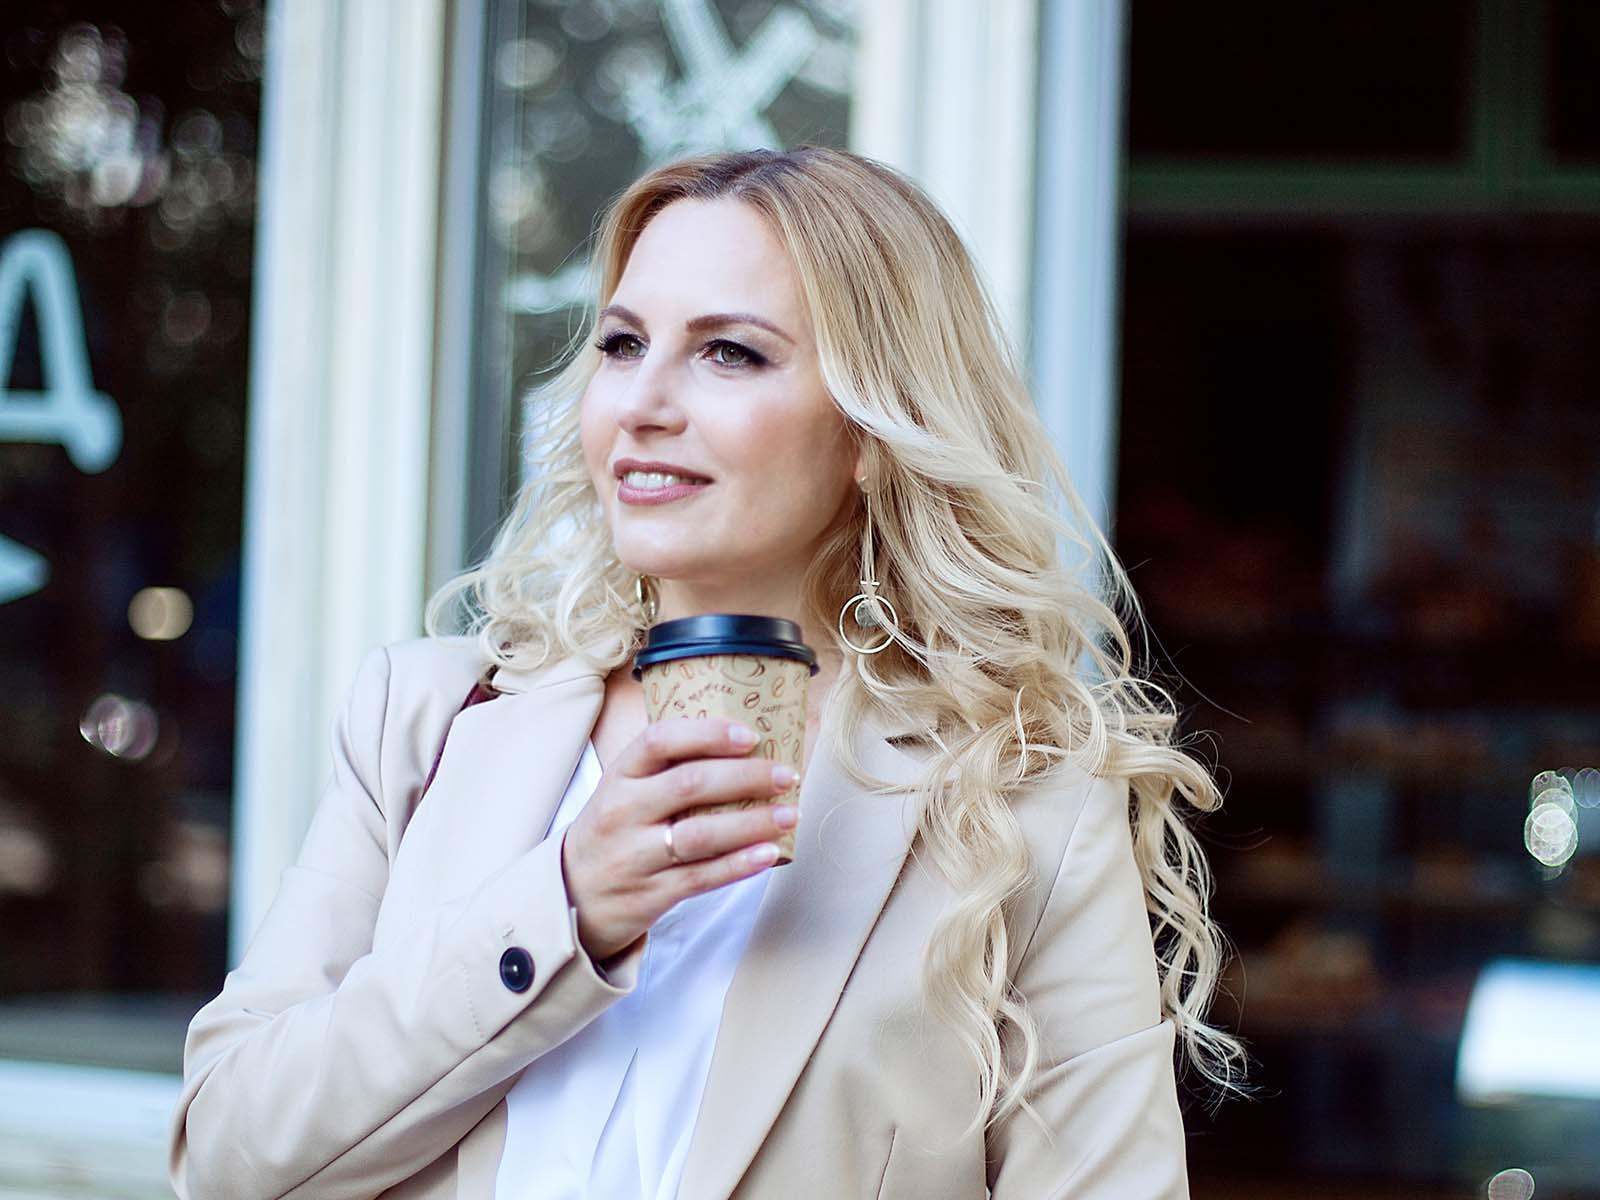 Екатерина Кутюкова, топ-менеджер фриланс-биржи Kwork